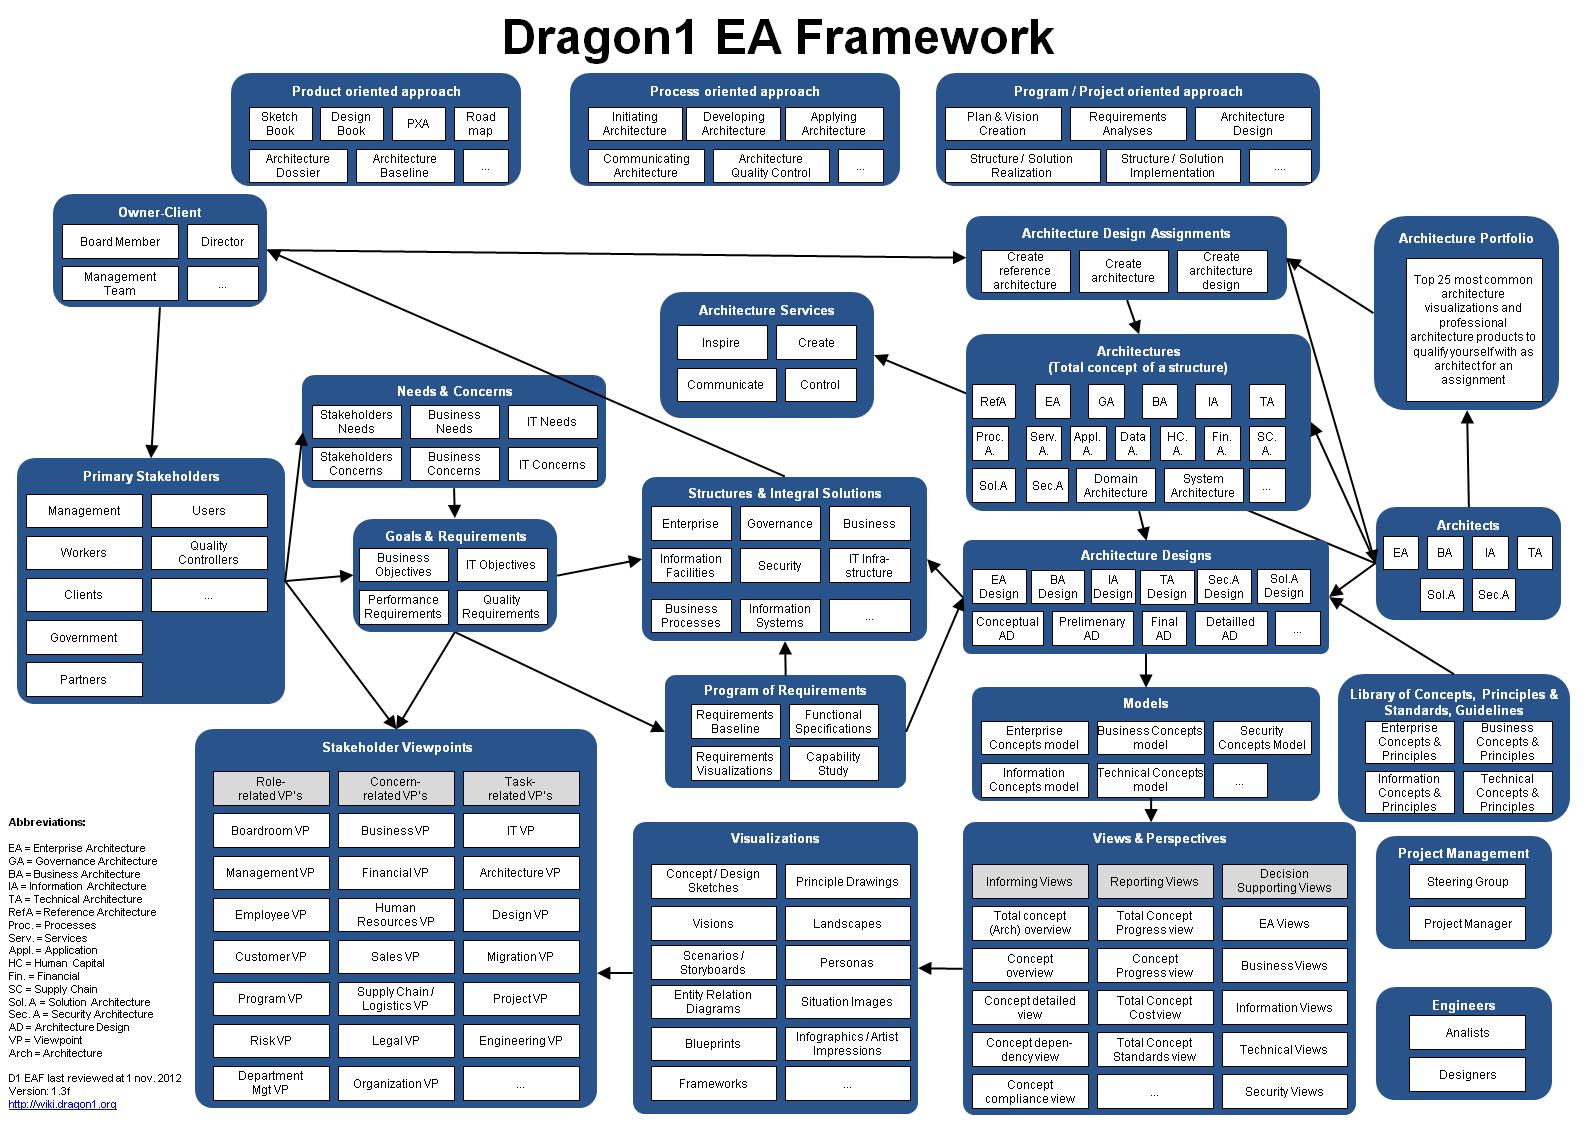 Diagrams application landscape diagram dragon1 supply chain dragon1 ea framework enterprise architecture pinterest 1ff63f47cdc9aee60e87aaf83dfcbb22 209065607676486558 diagrams application landscape diagram dragon1 pooptronica Gallery